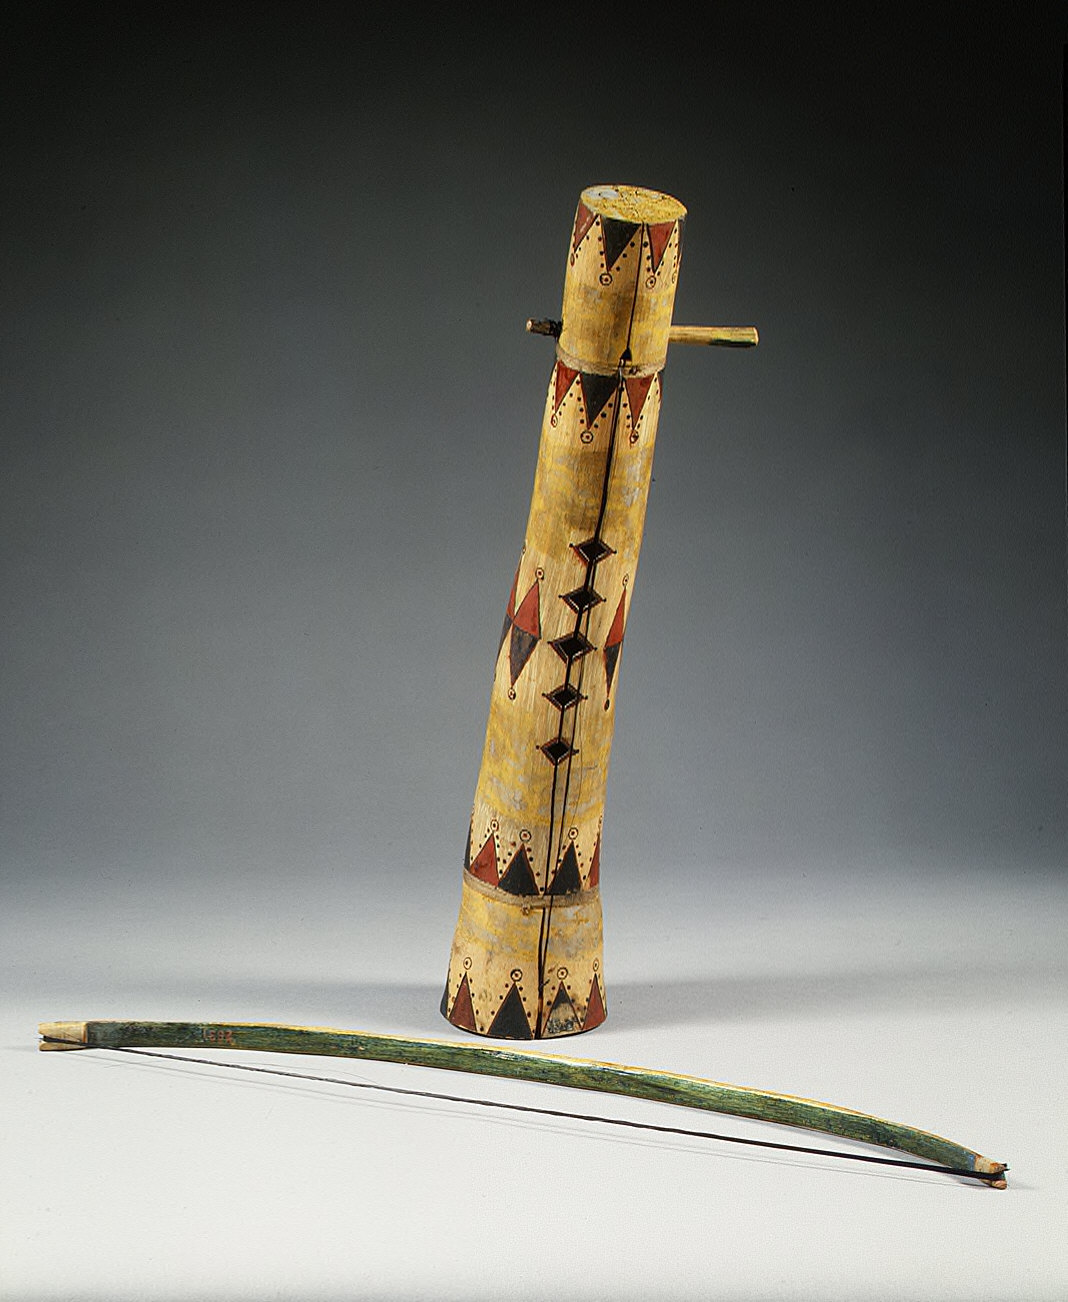 Tzii'edo' a 'tl (Apache Fiddle)